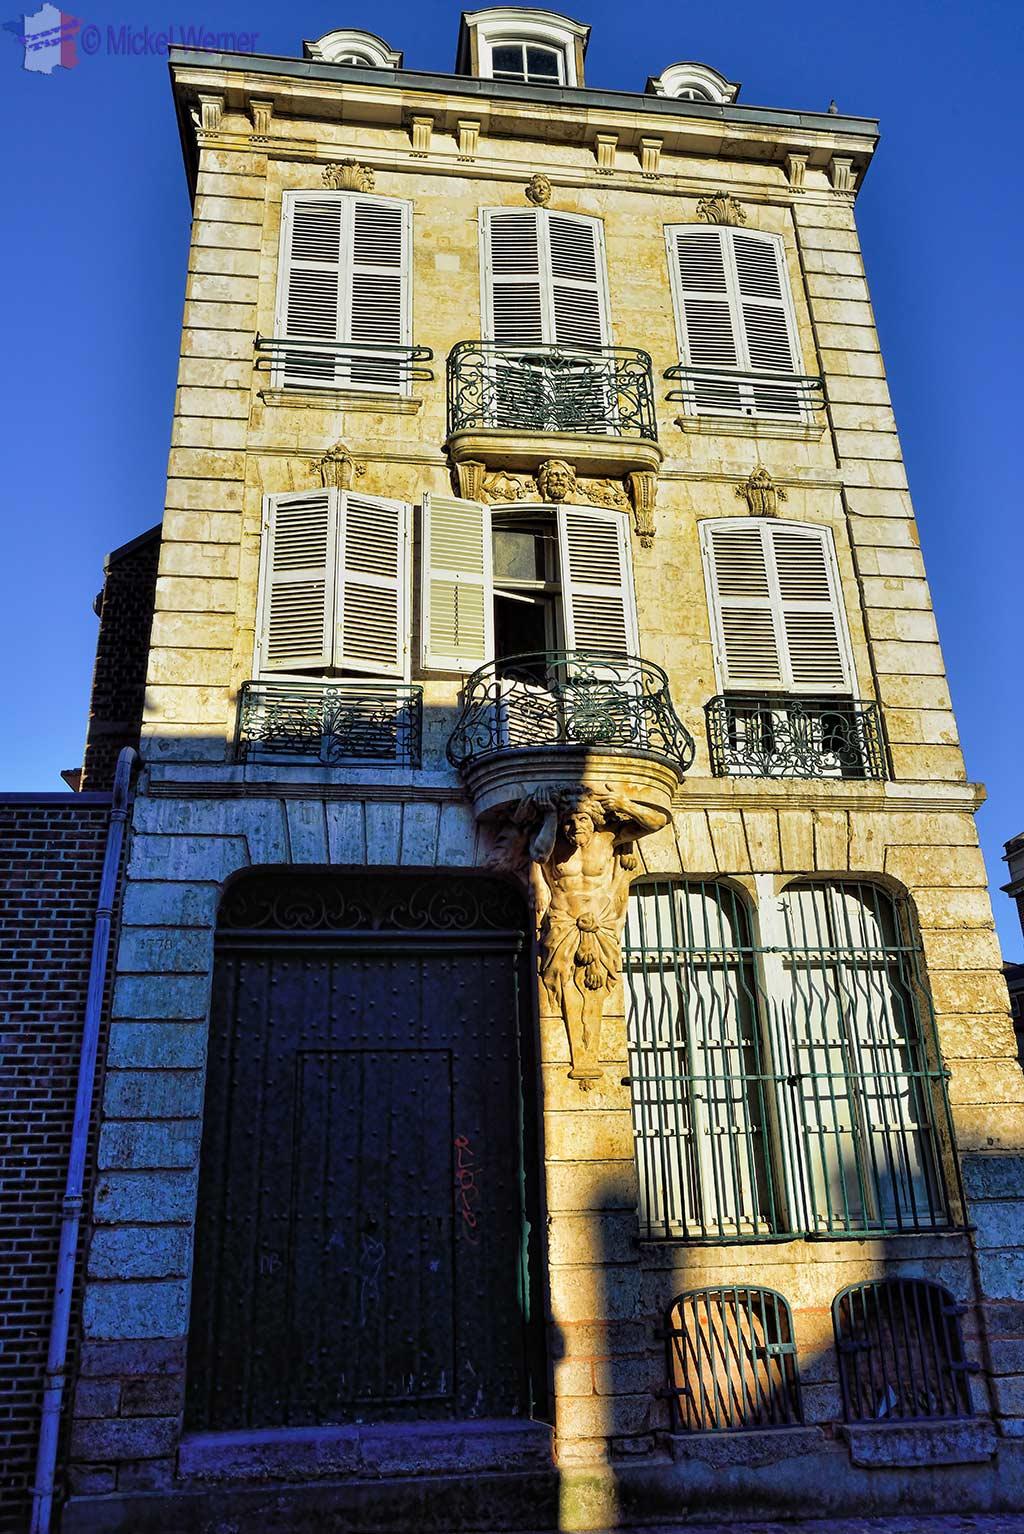 Maison de Samson in Amiens